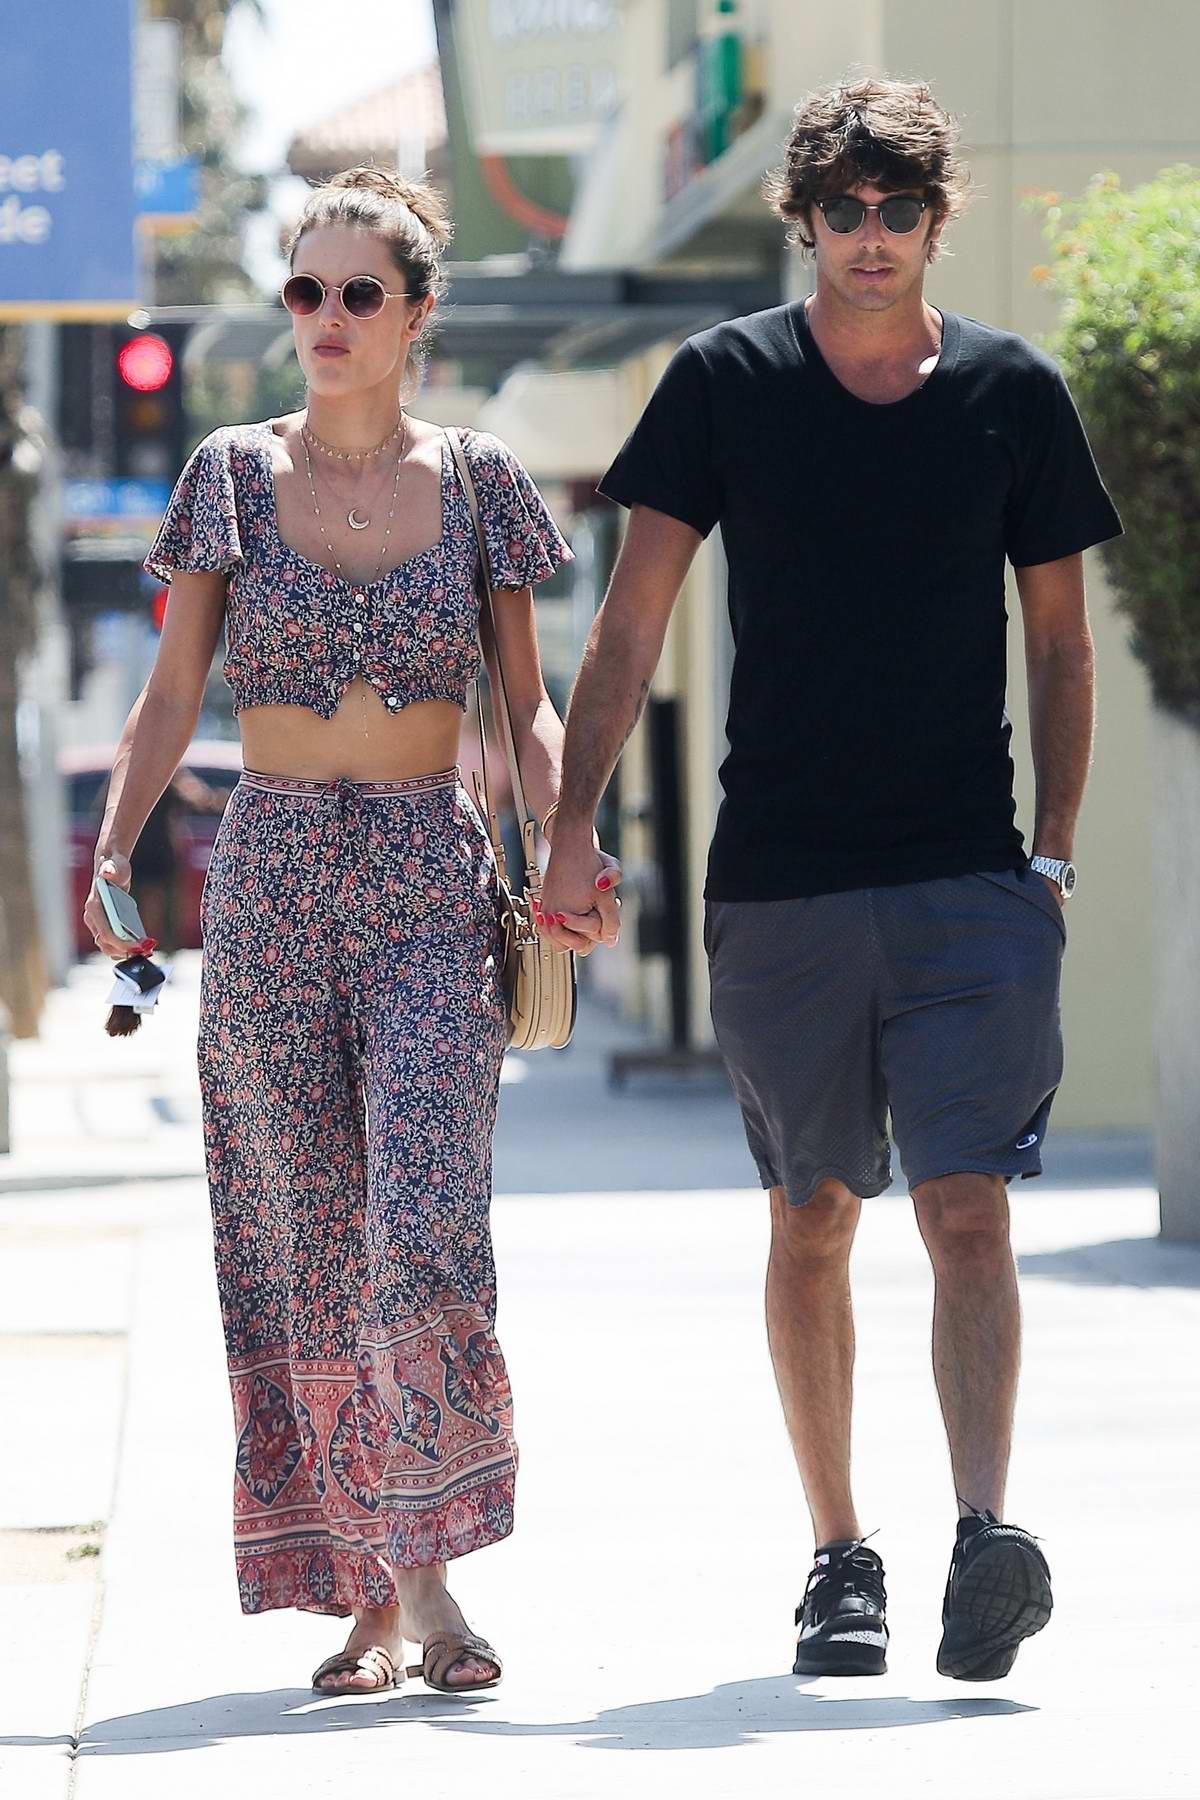 Alessandra Ambrosio enjoys a stroll with boyfriend Nicolo Oddi after a quick lunch in Santa Monica, California